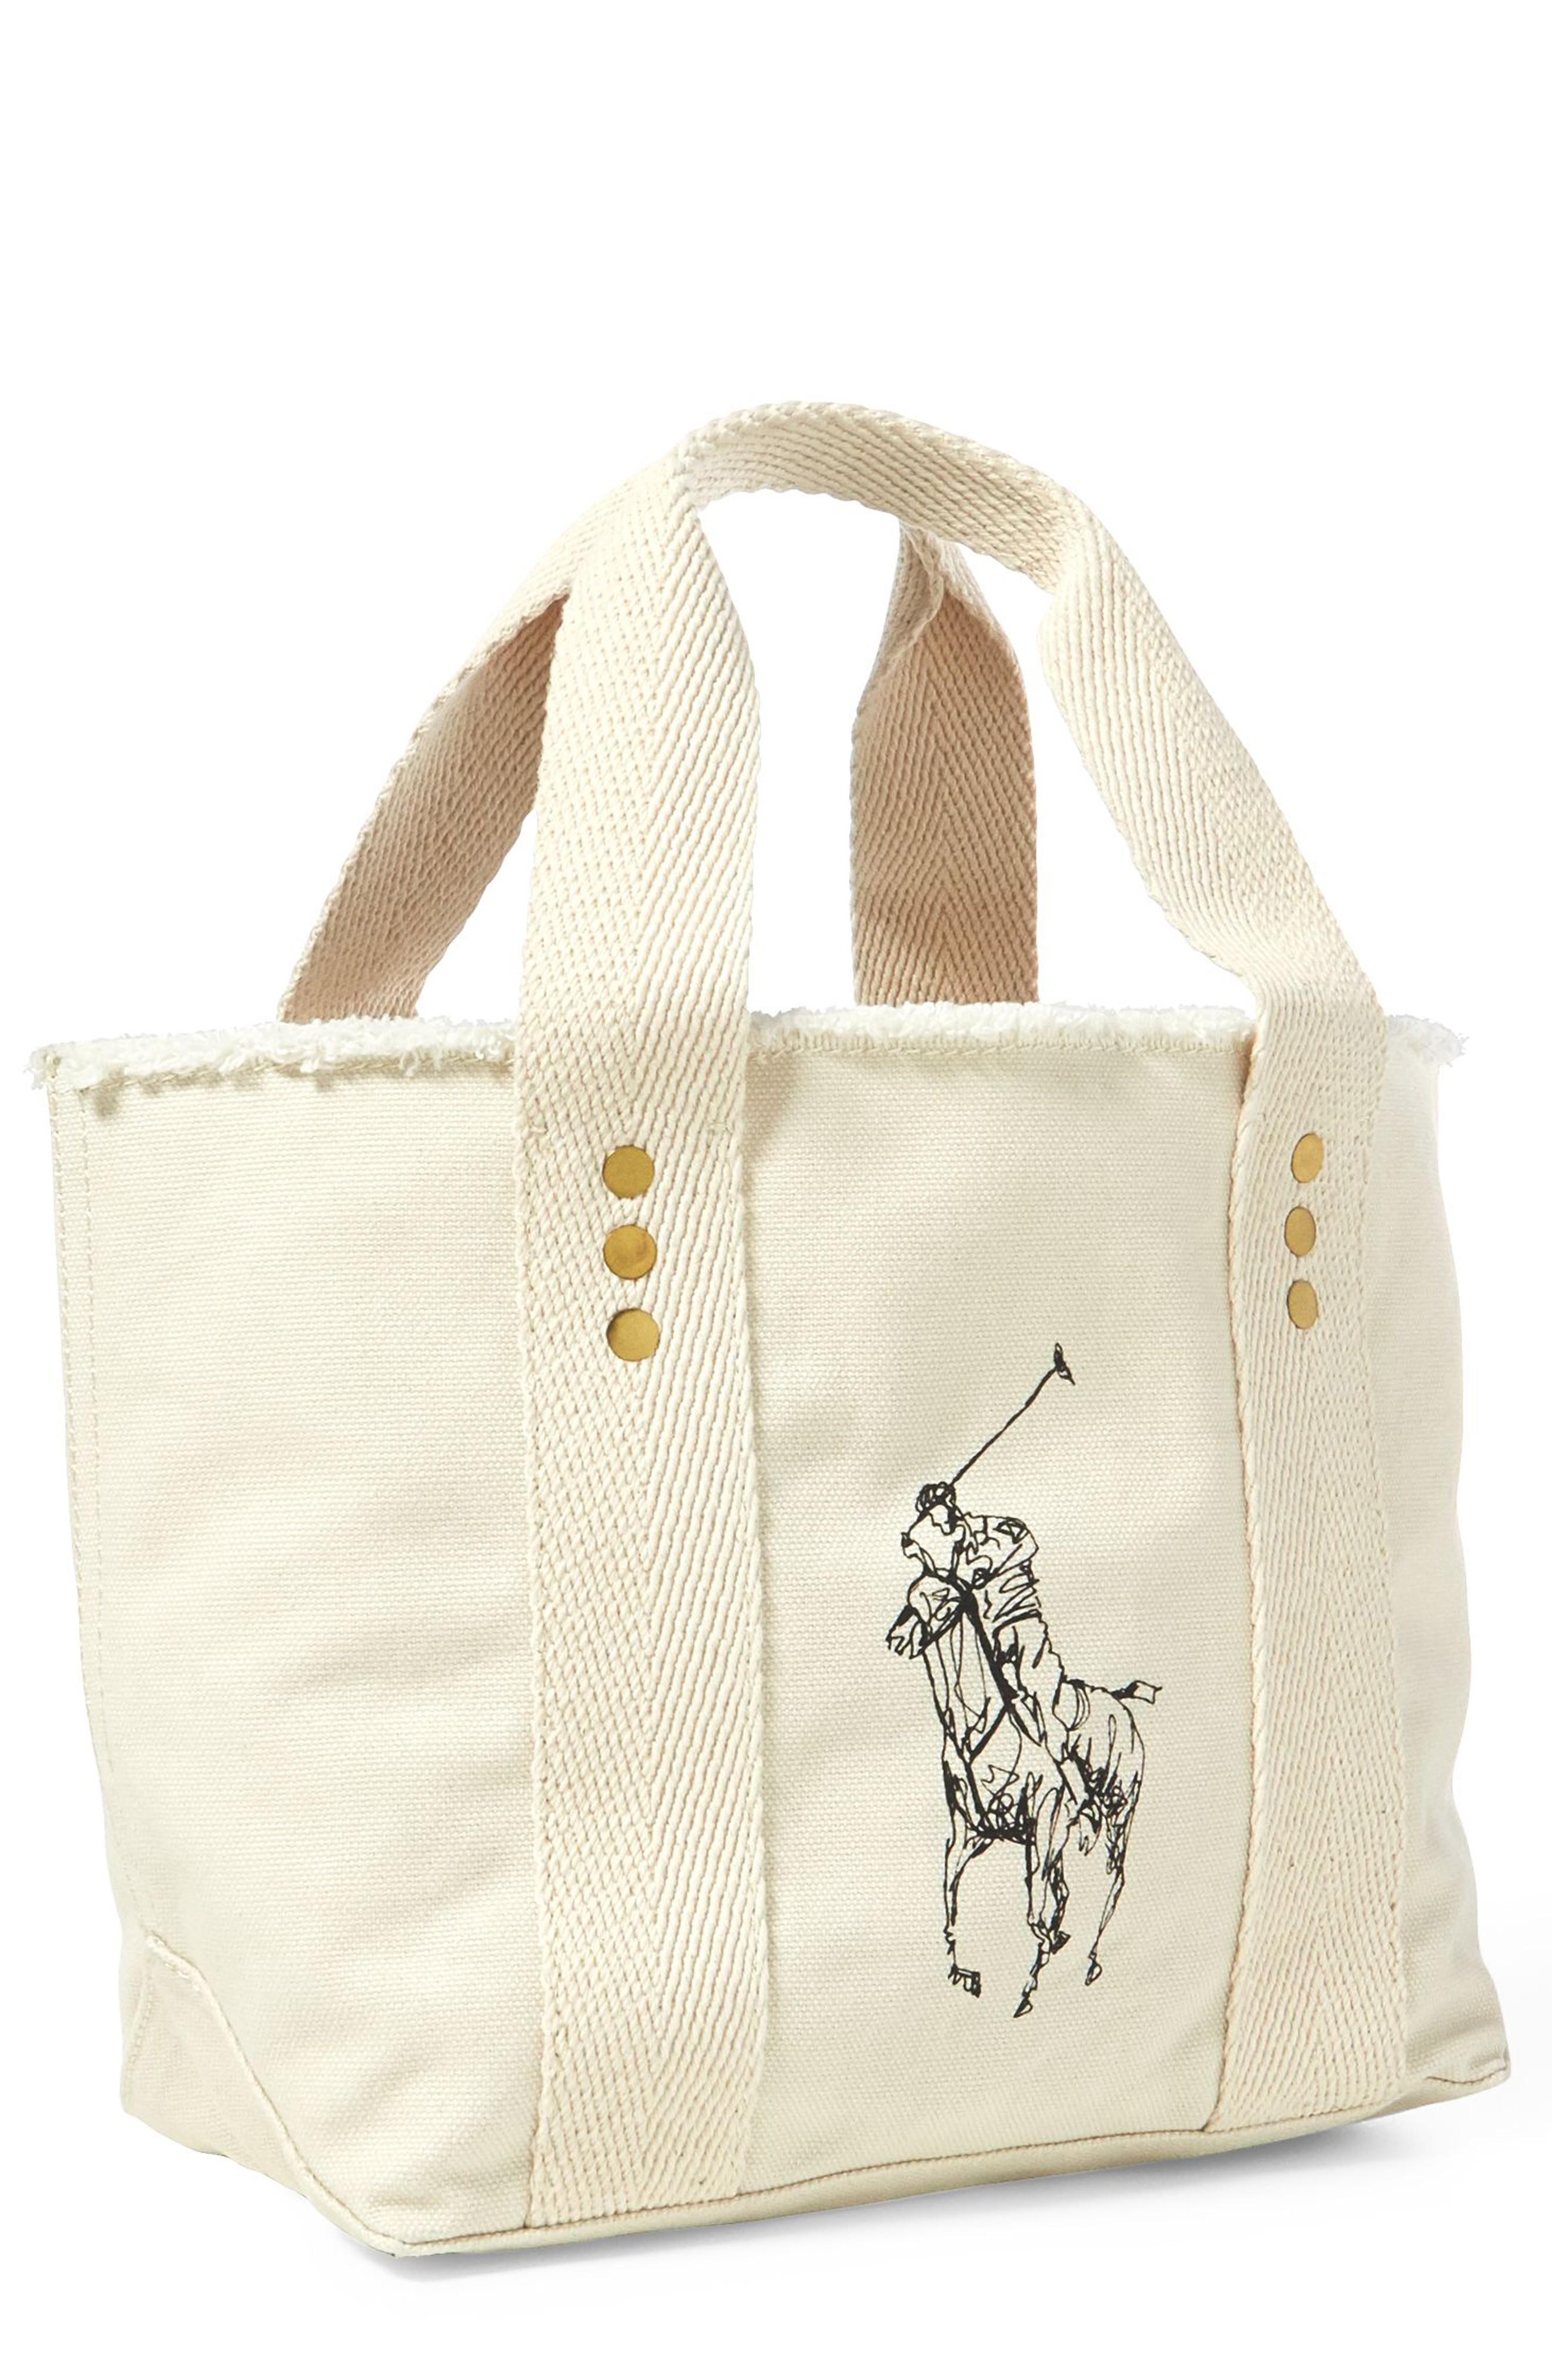 Polo Ralph Lauren Small Pony Canvas Tote - Beige In Ecru/ Ecru